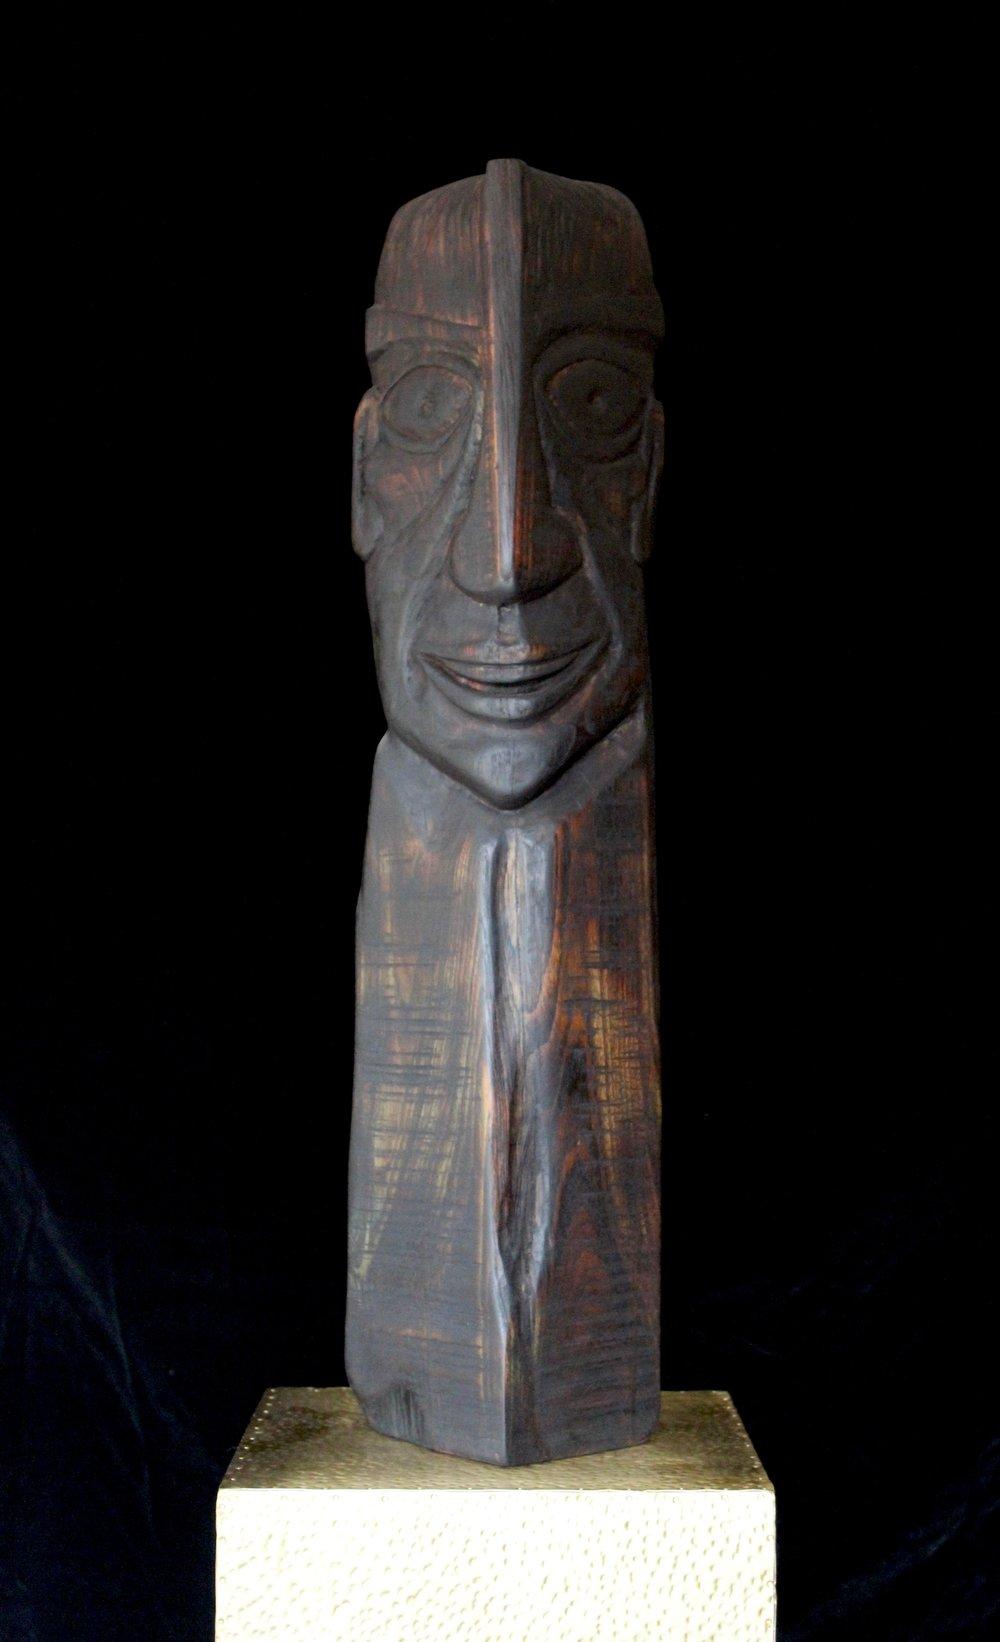 "Formed Resonance Series, 2017, Bronze,26"" x 12"" x 10"", Art no; 13926"